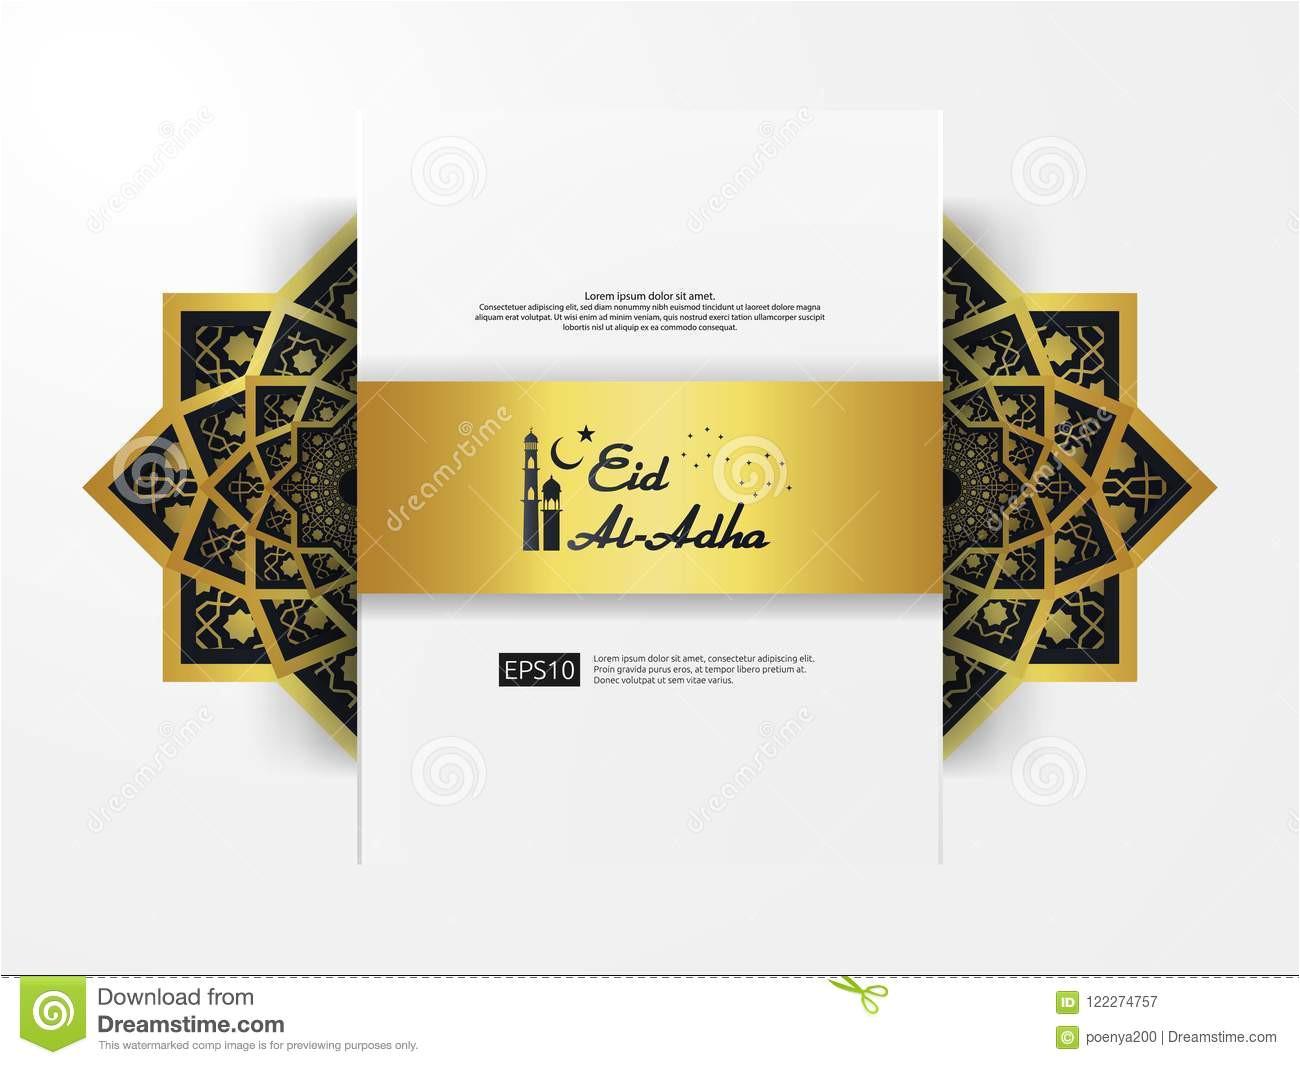 eid al adha mubarak greeting design abstract gold color mandala pattern ornament element islamic invitation banner card 122274757 jpg